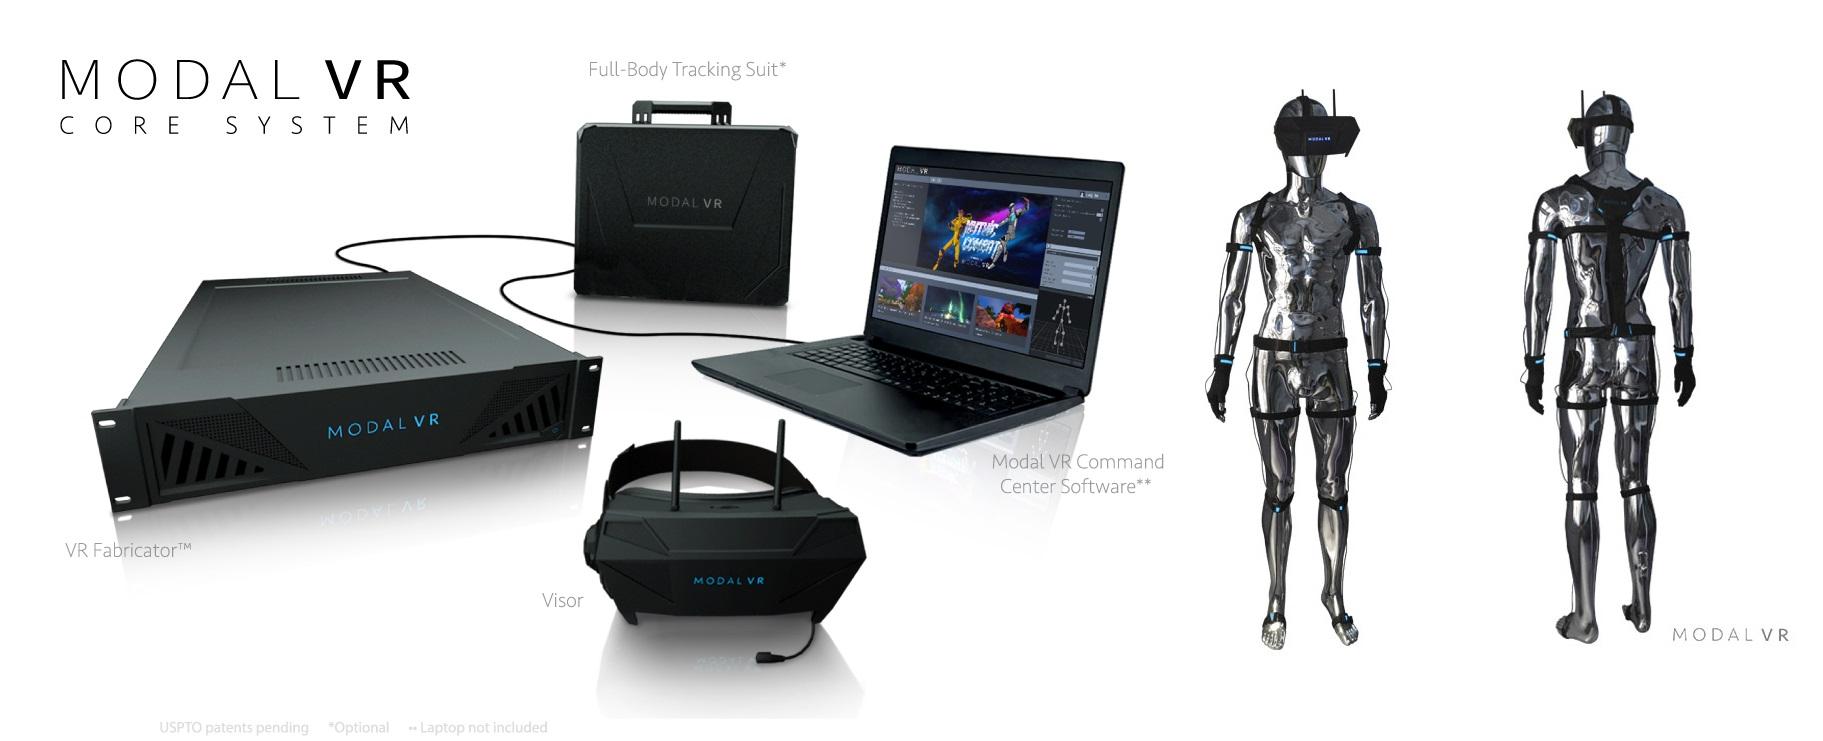 Modal VR